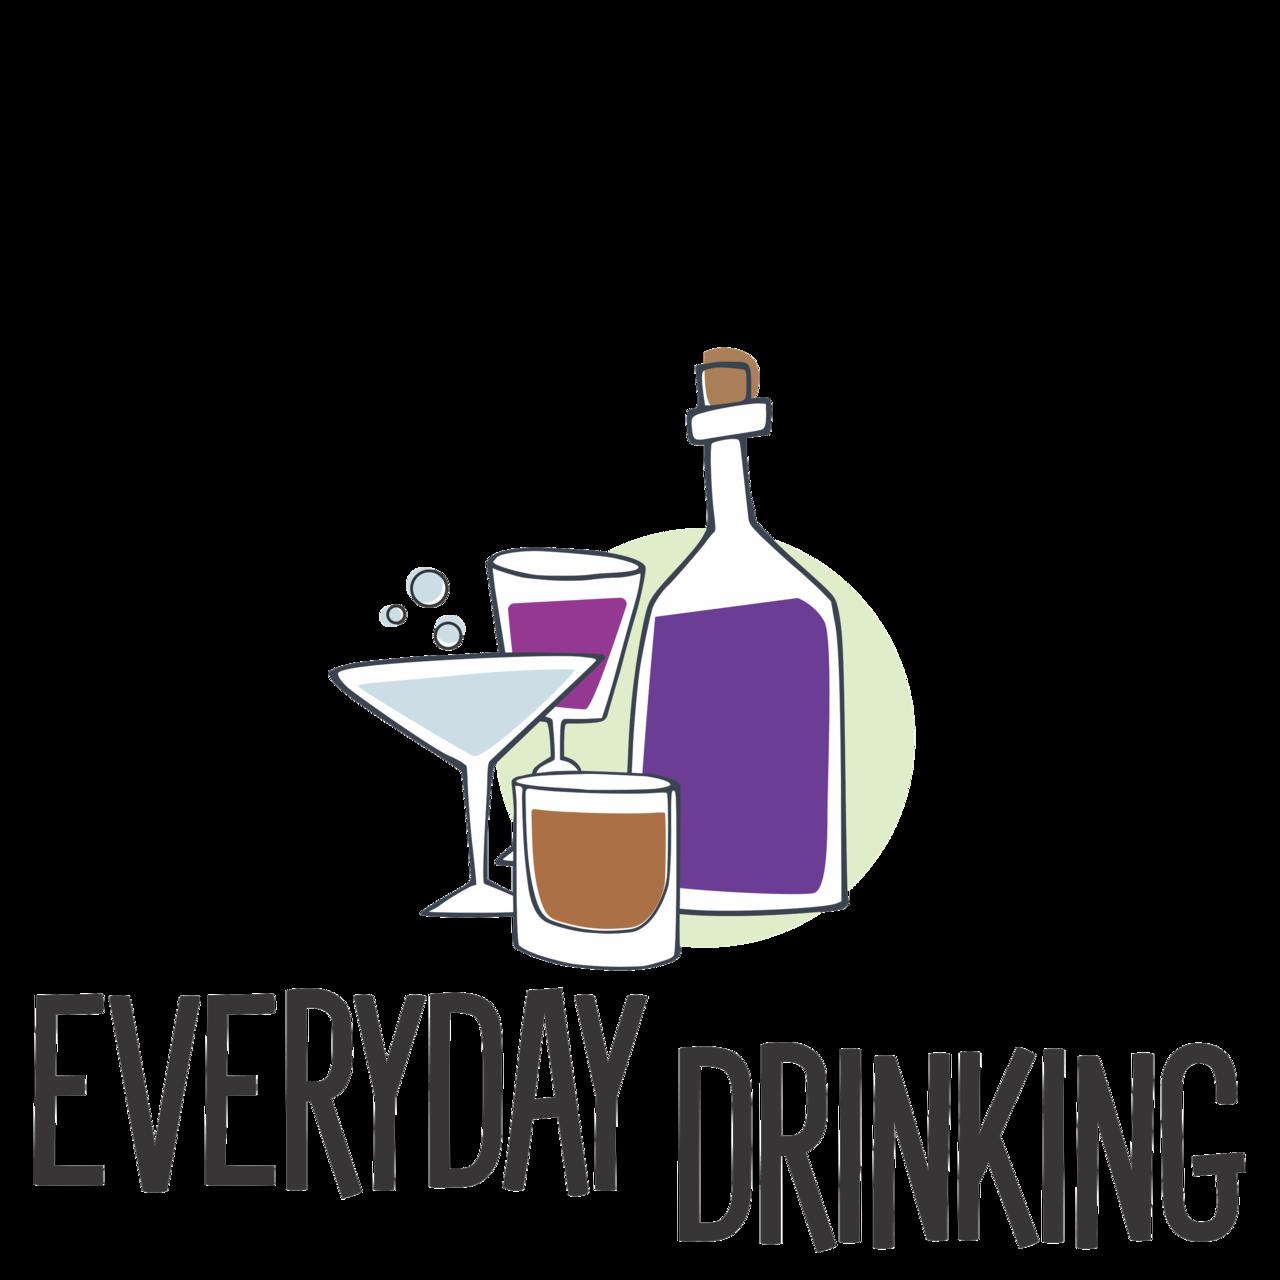 Everyday Drinking